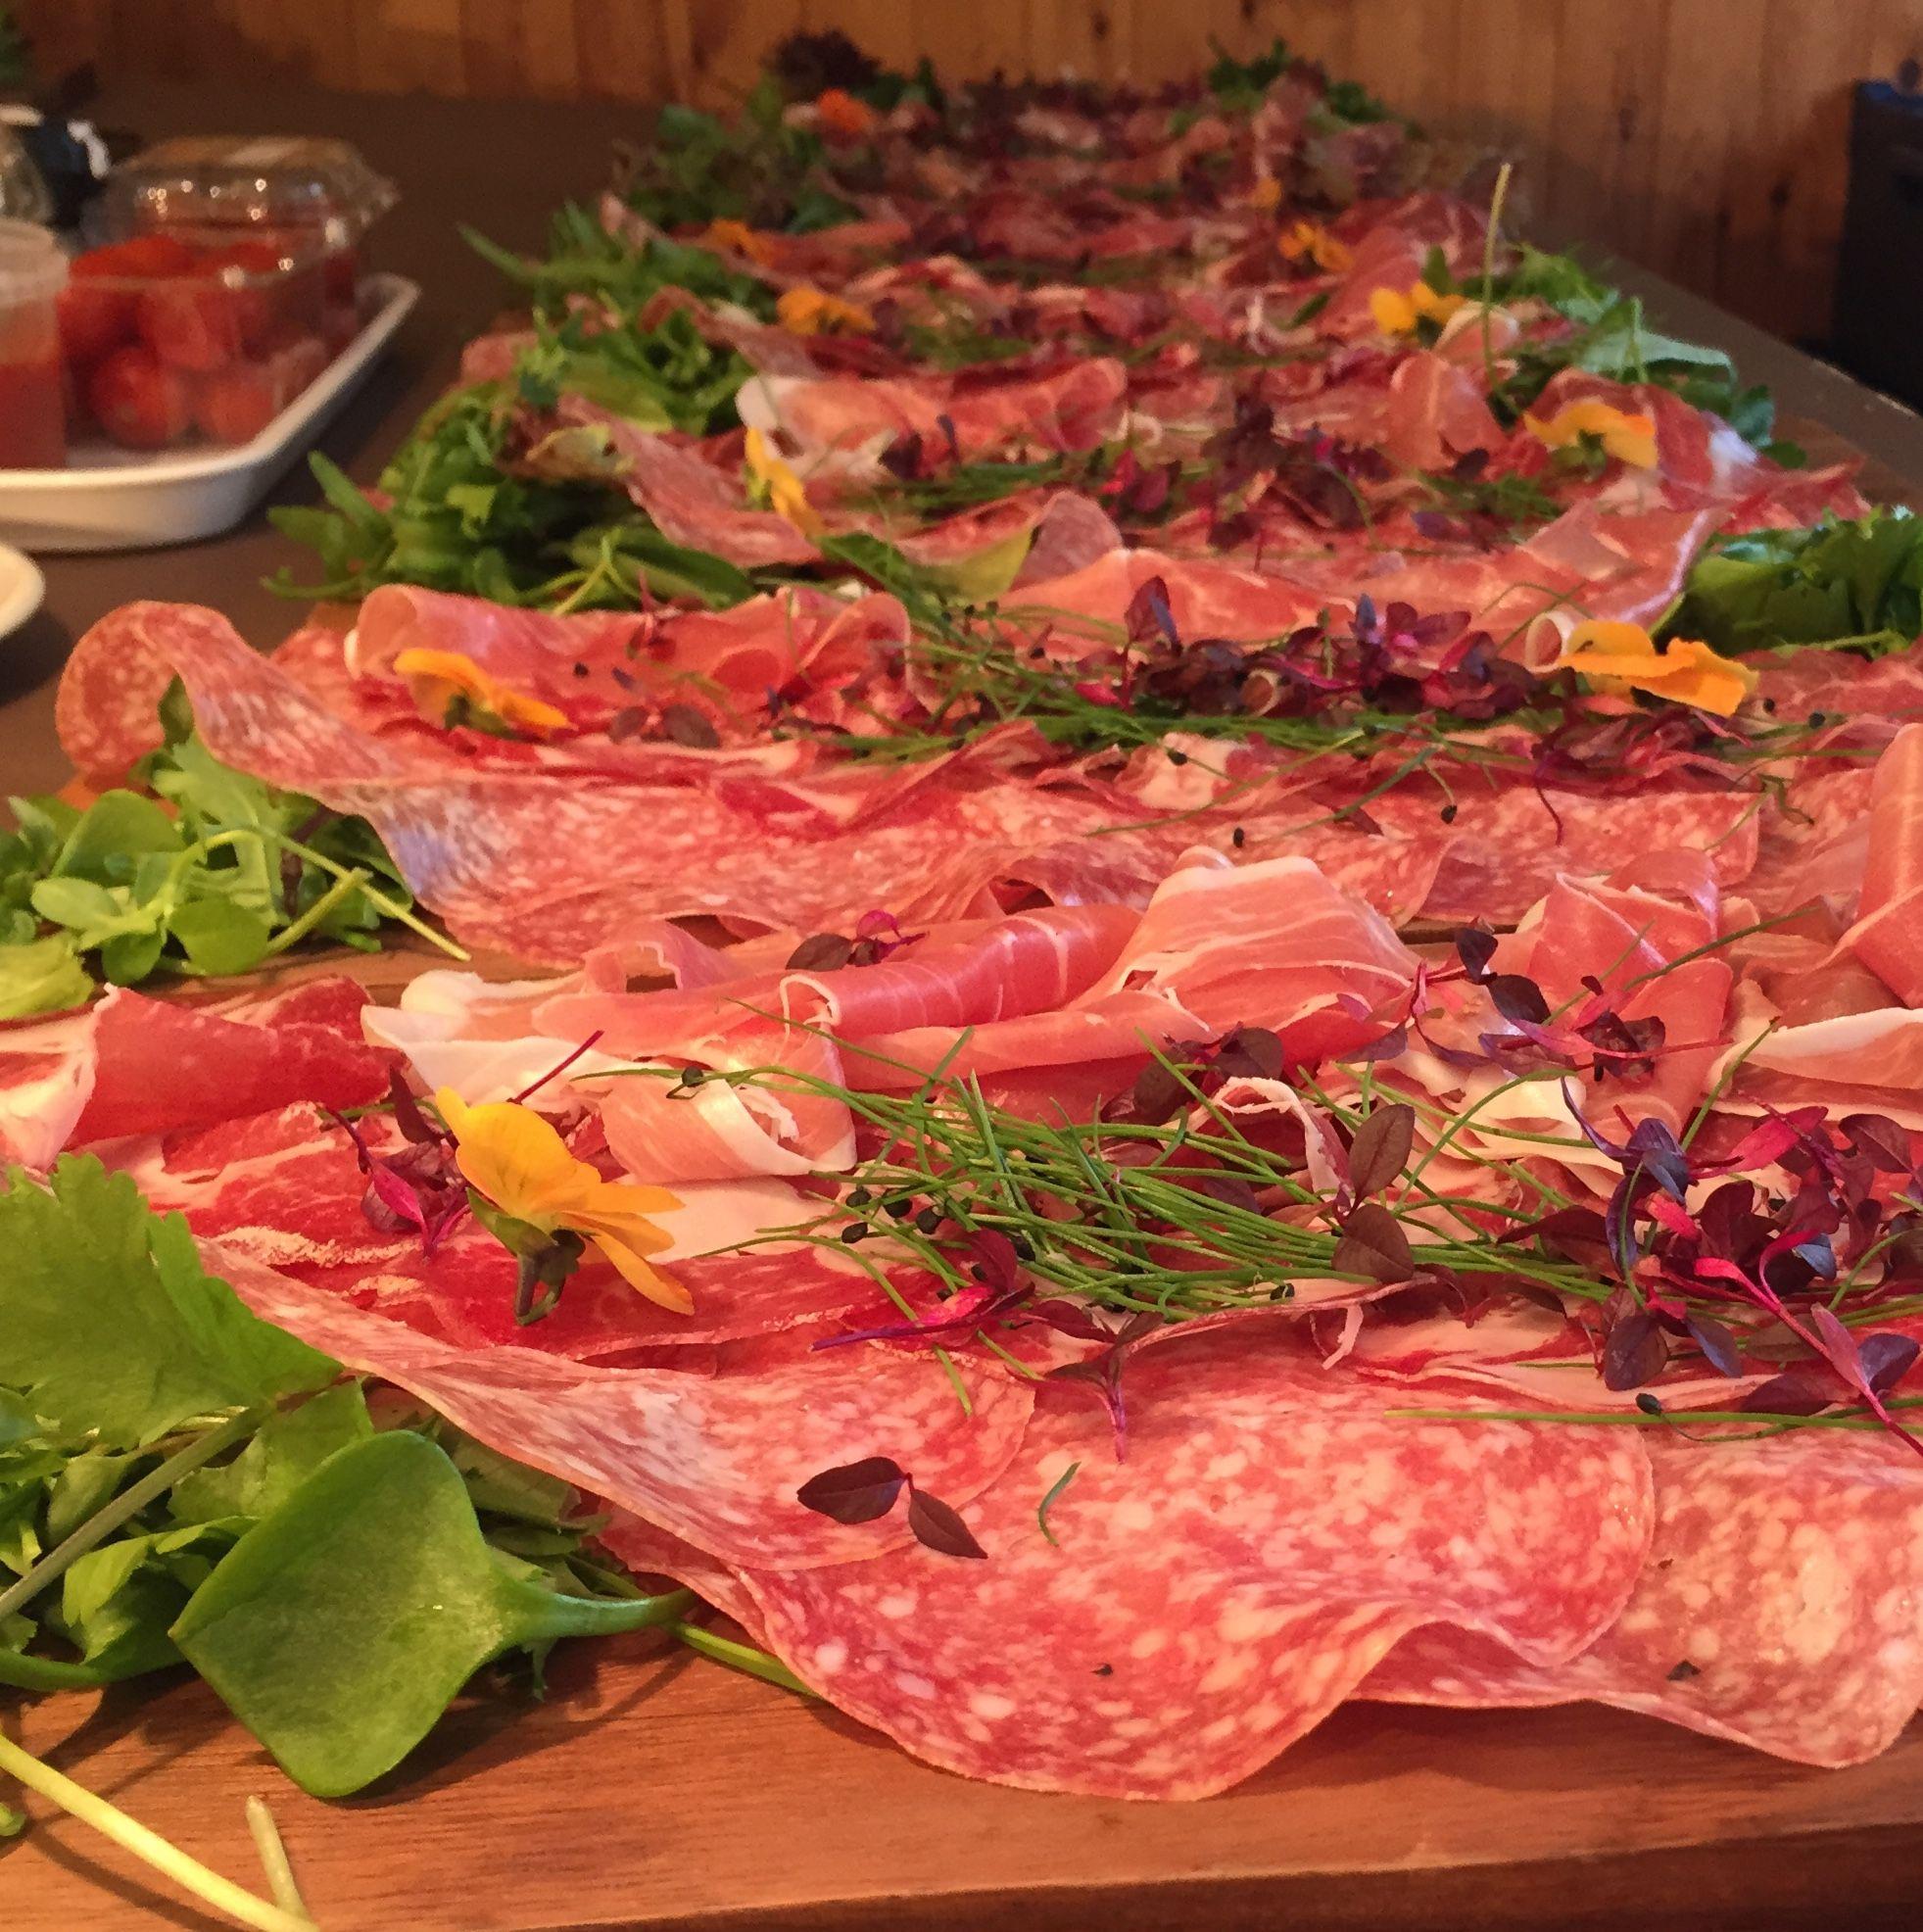 Our charcuterie platter as part of a mediterranean inspired buffet